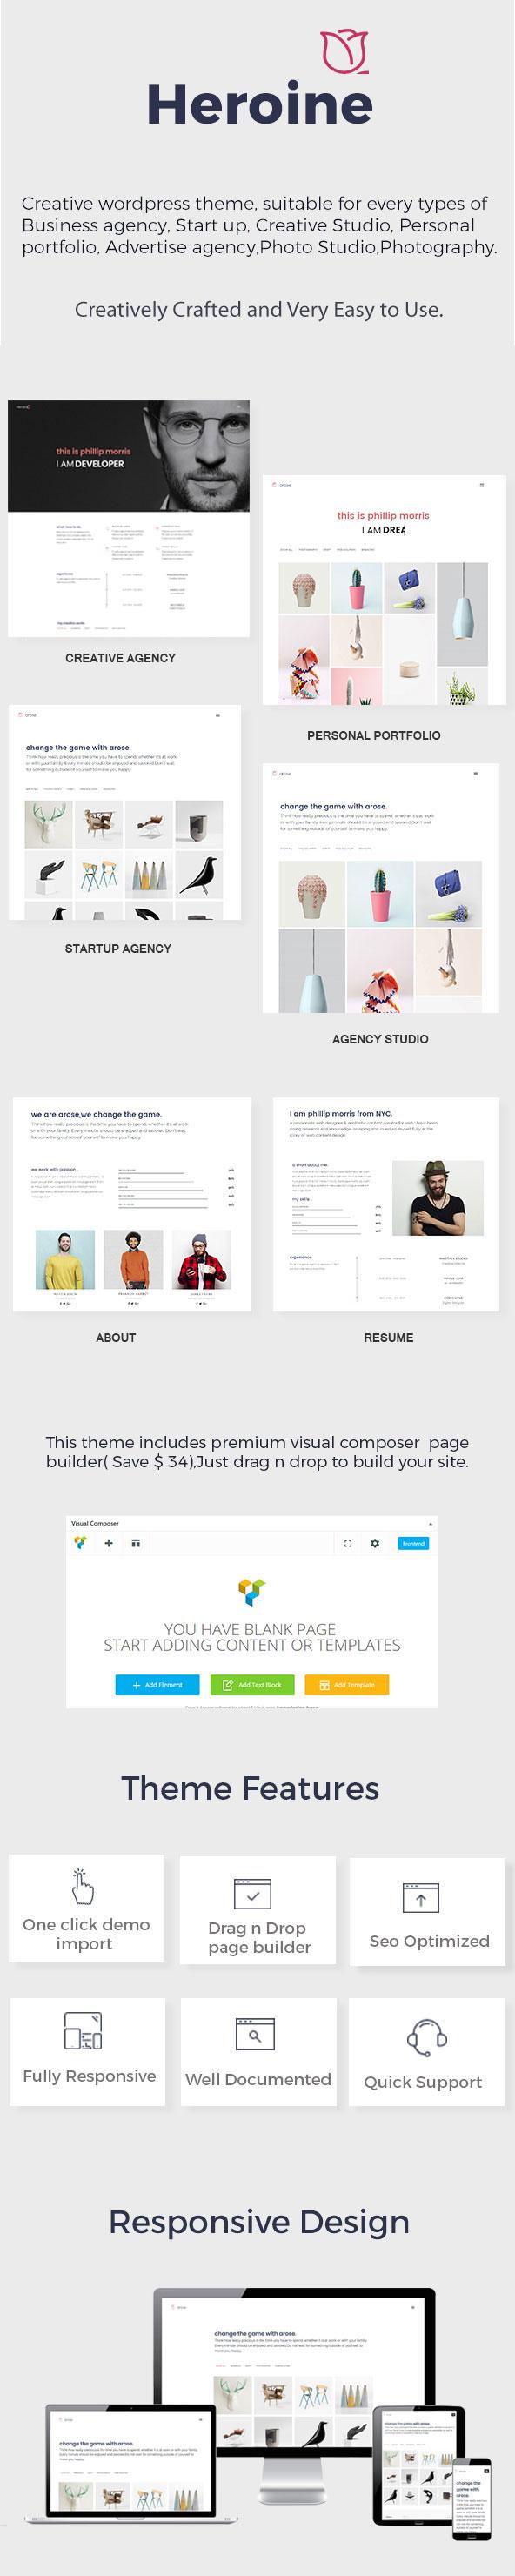 Heroine - Creative Minimal Portfolio WordPress Theme - 3